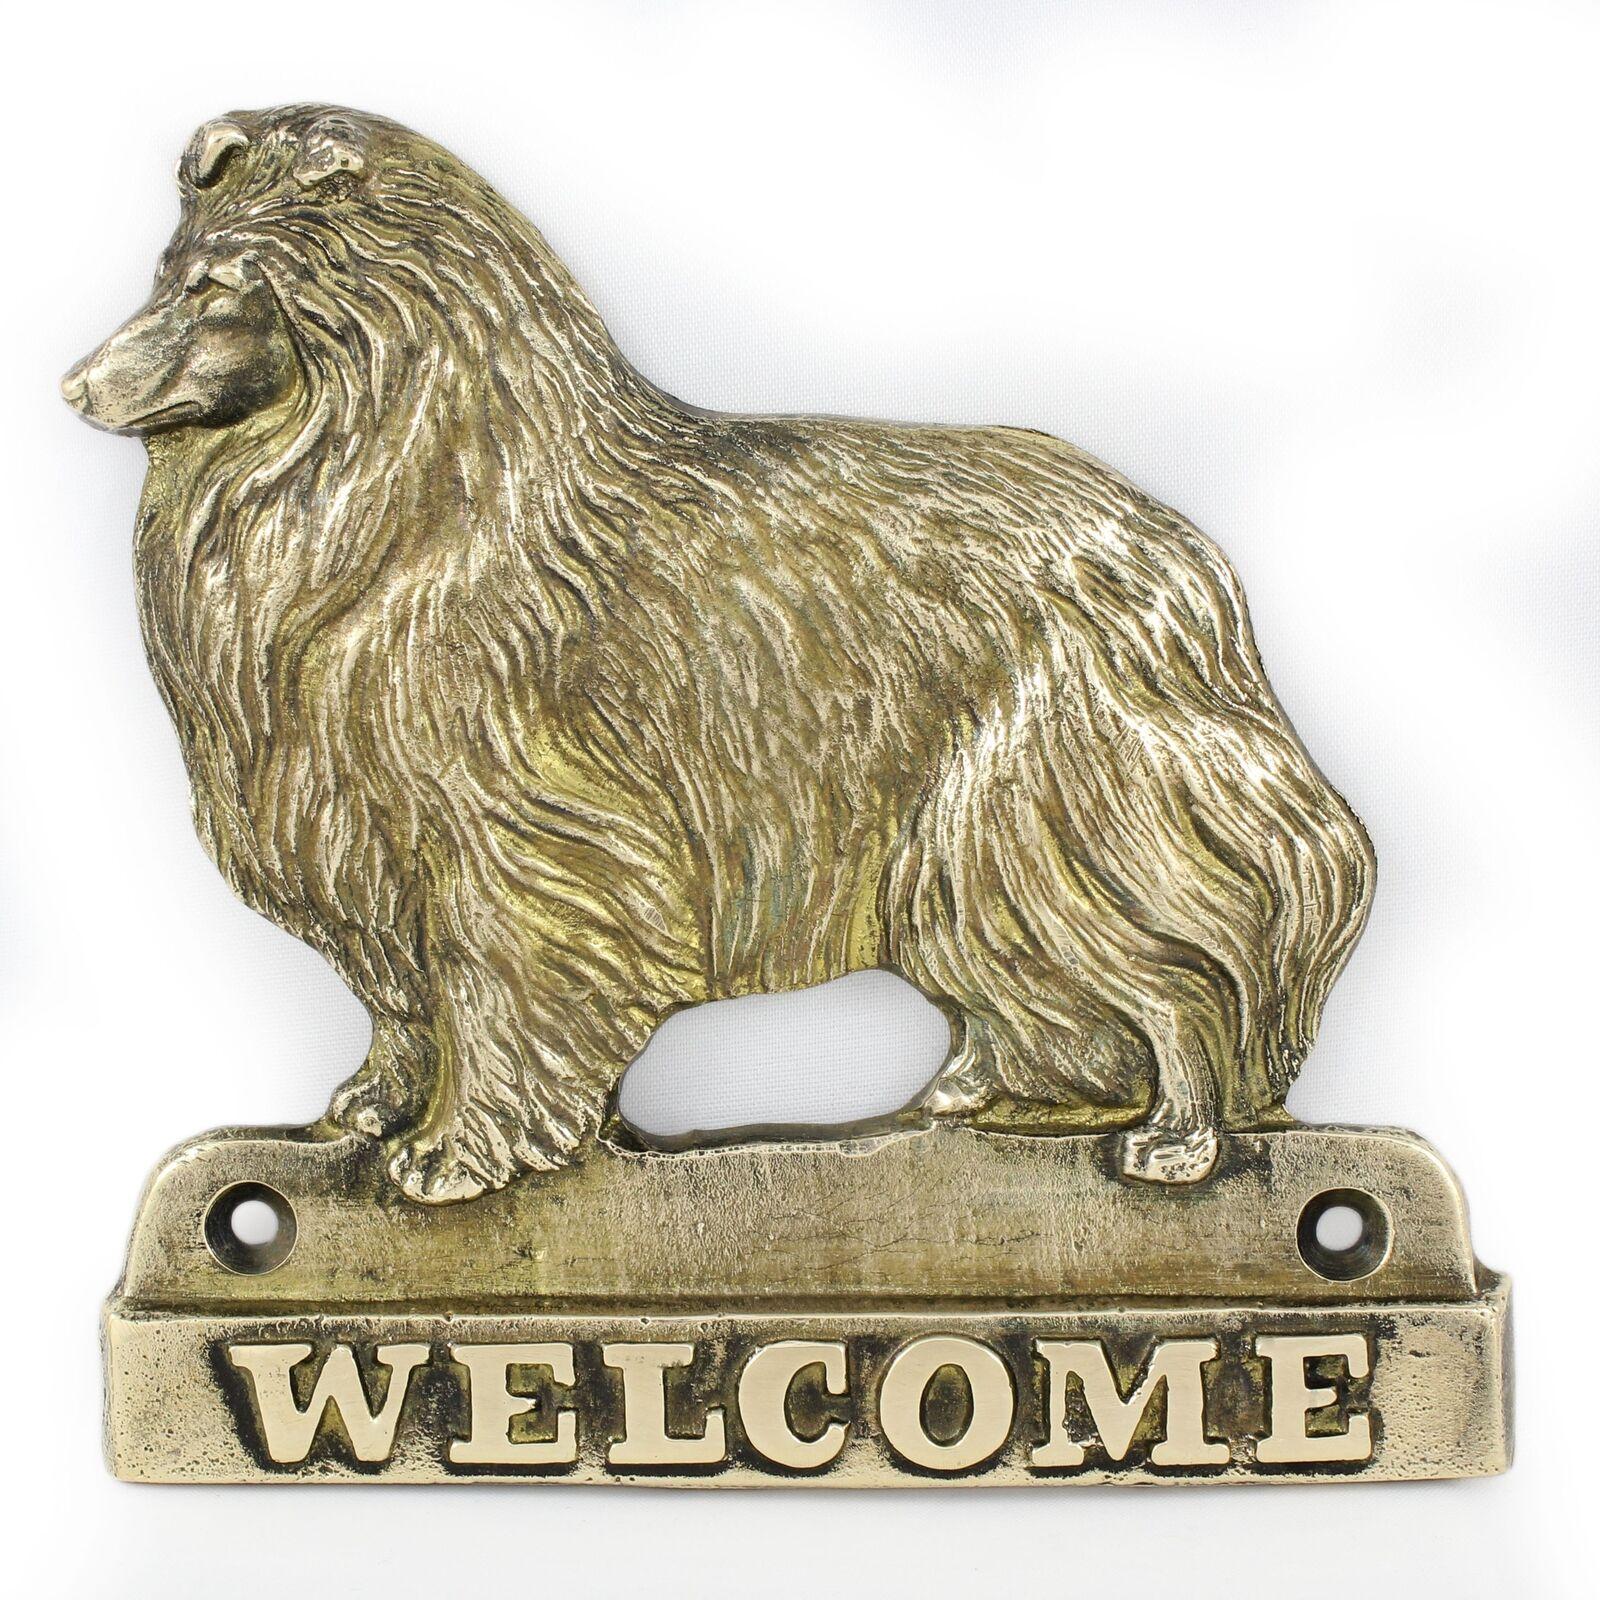 Shetland Sheepdog - brass tablet with image of a dog, Art Dog